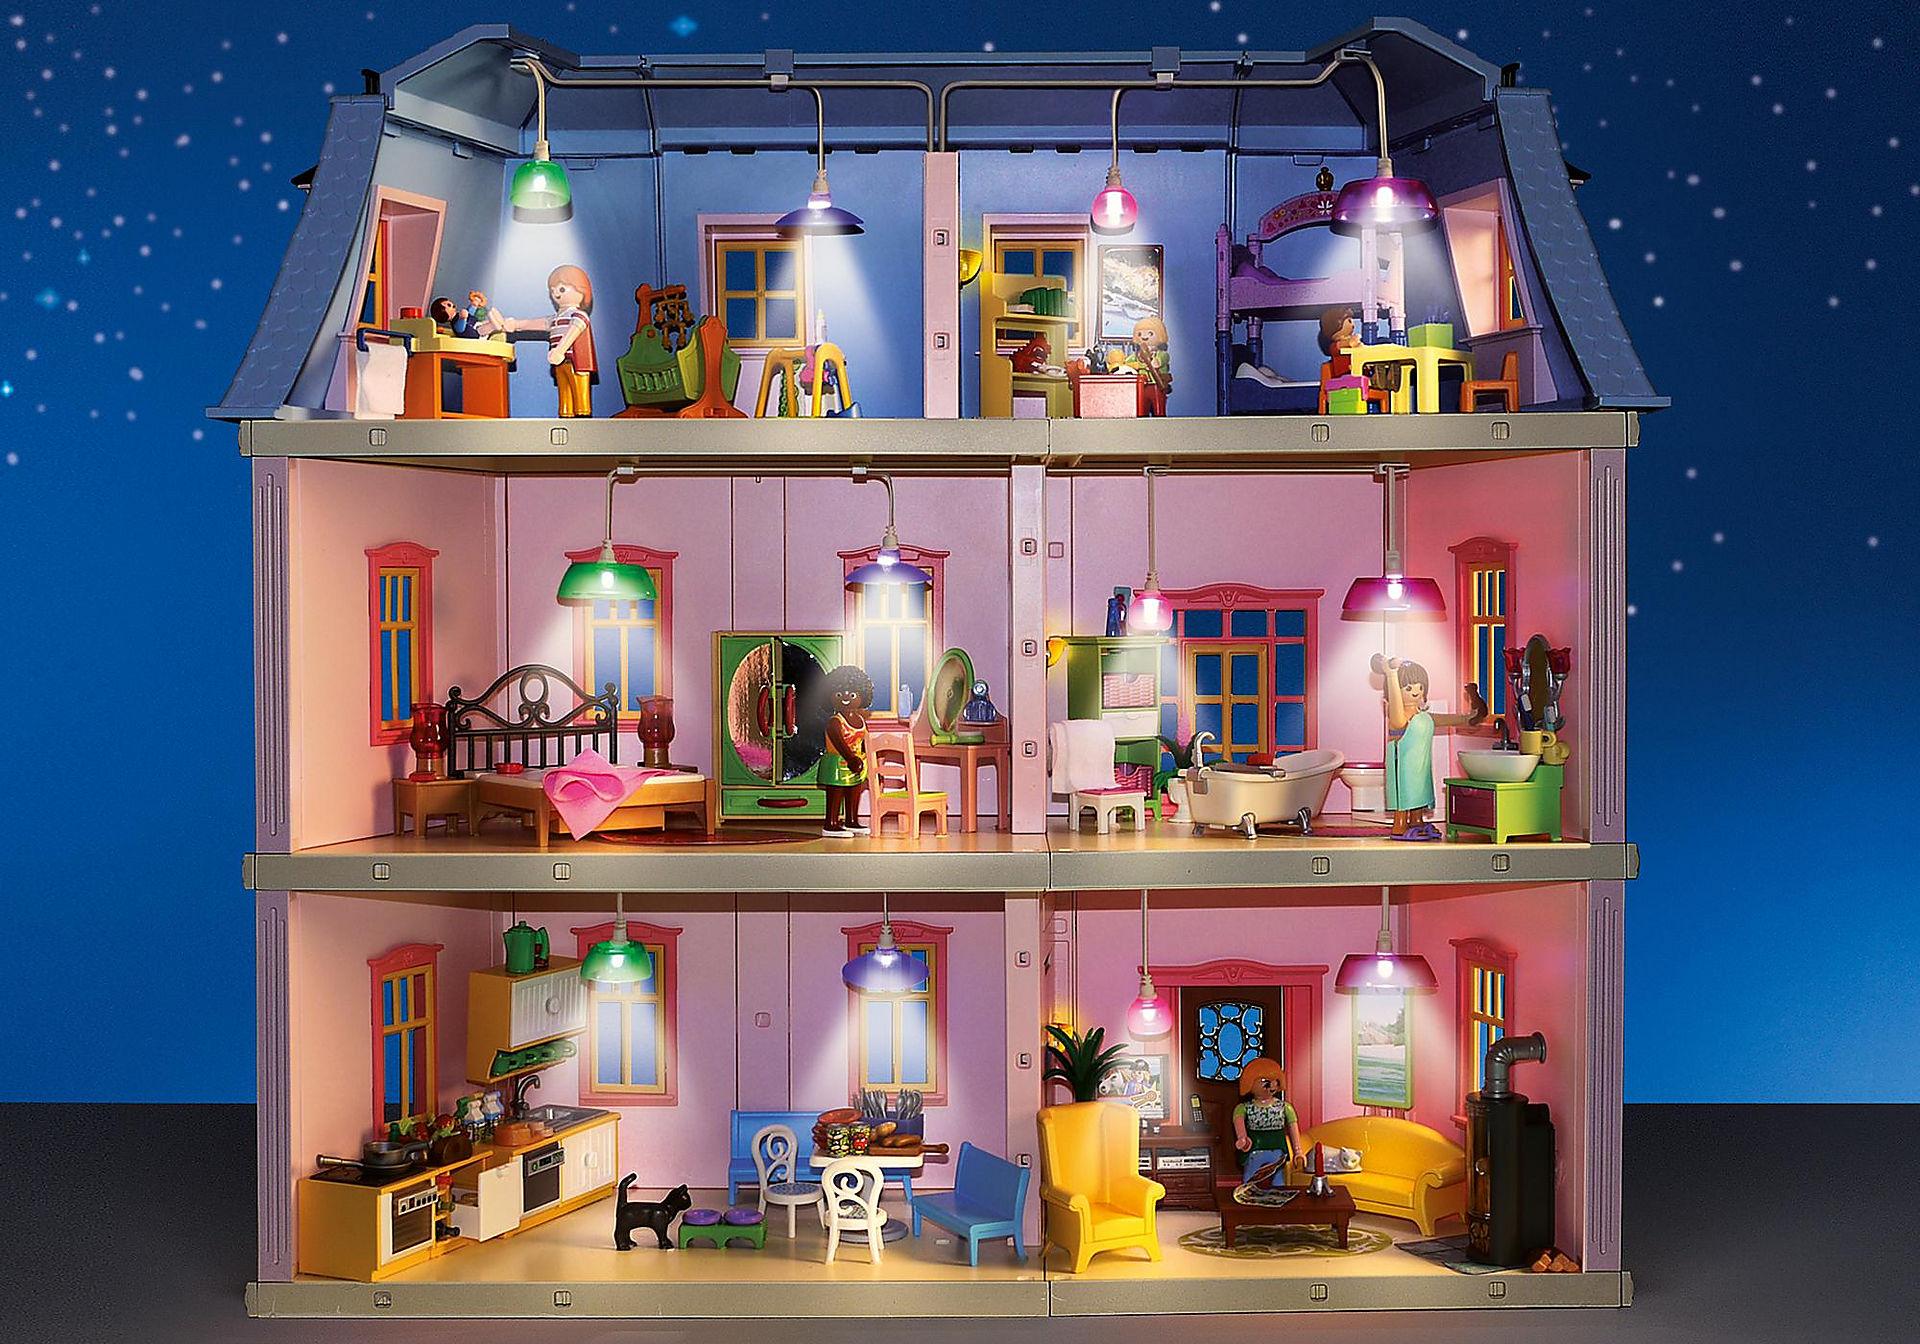 6456 Light Set for Deluxe Dollhouse (5303) zoom image2